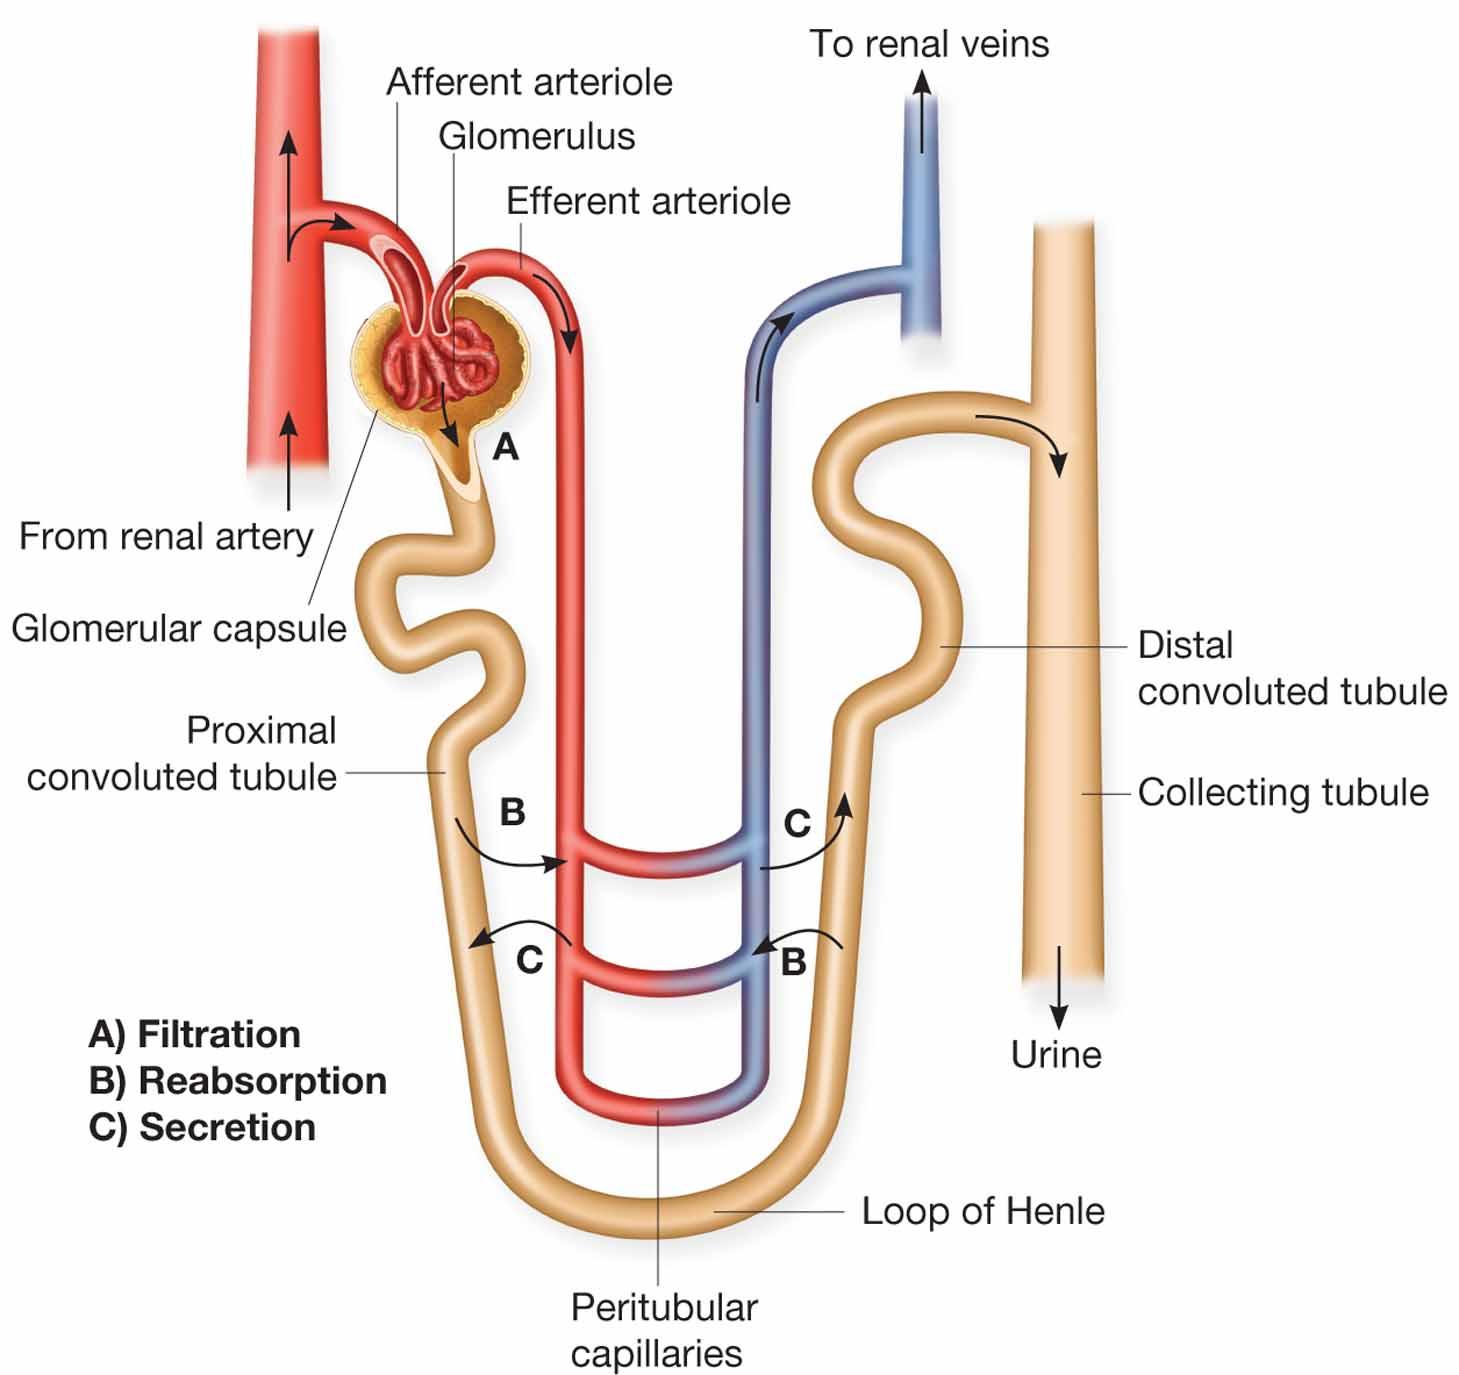 hight resolution of tubular reabsorption and tubular secretion